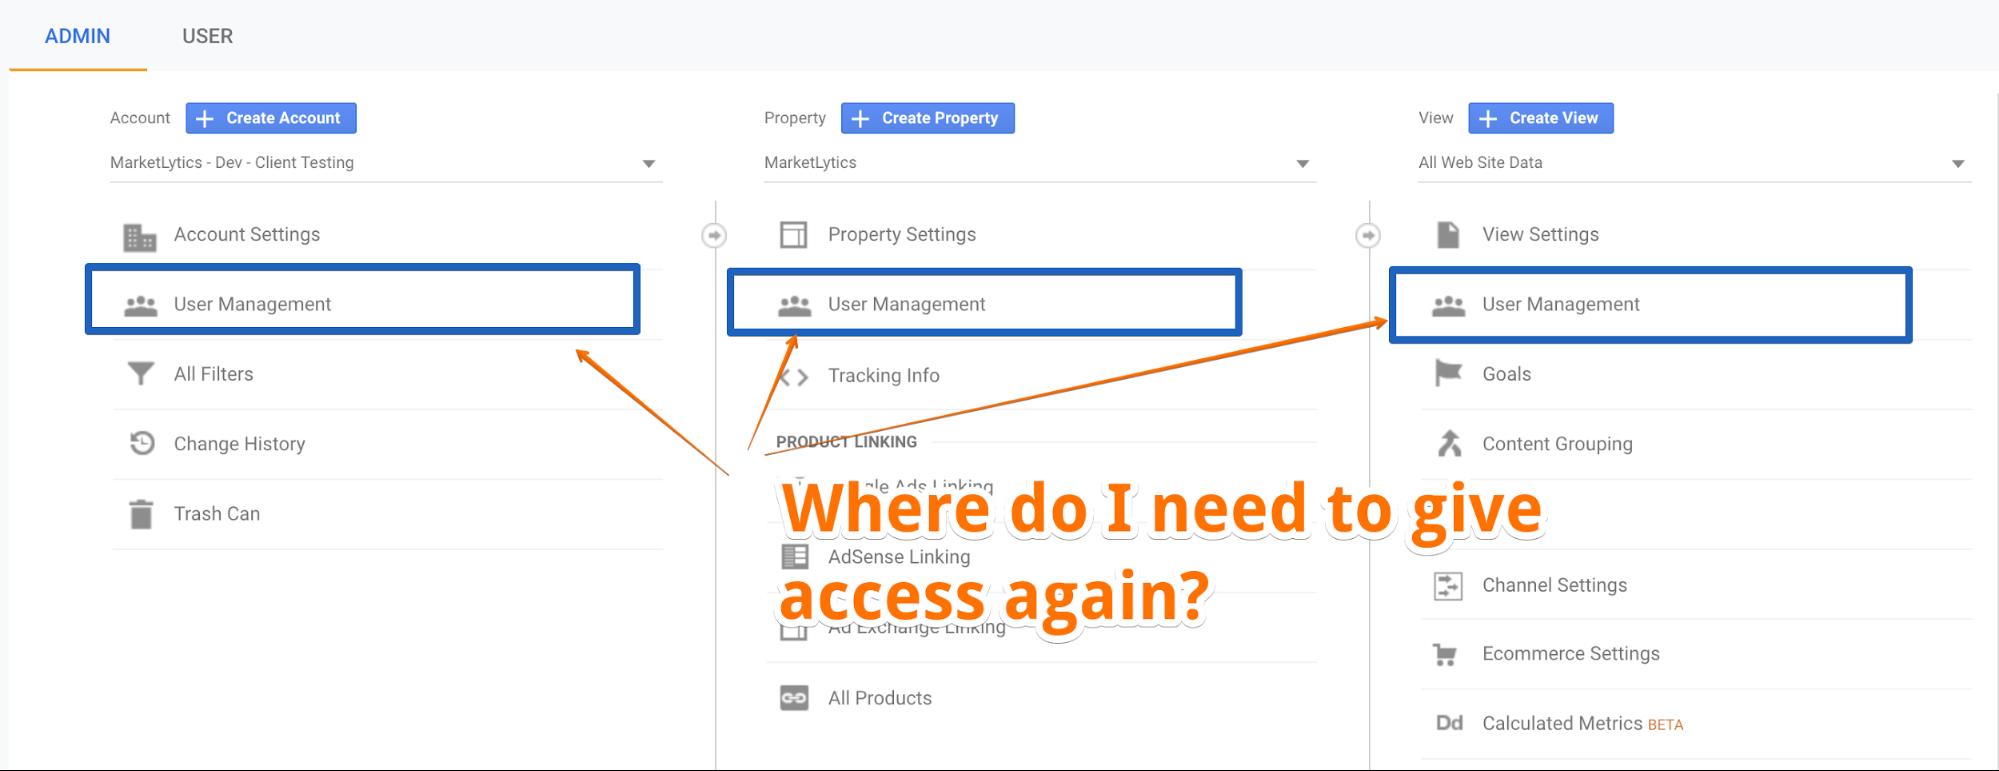 The three tiered access model of Google Analytics